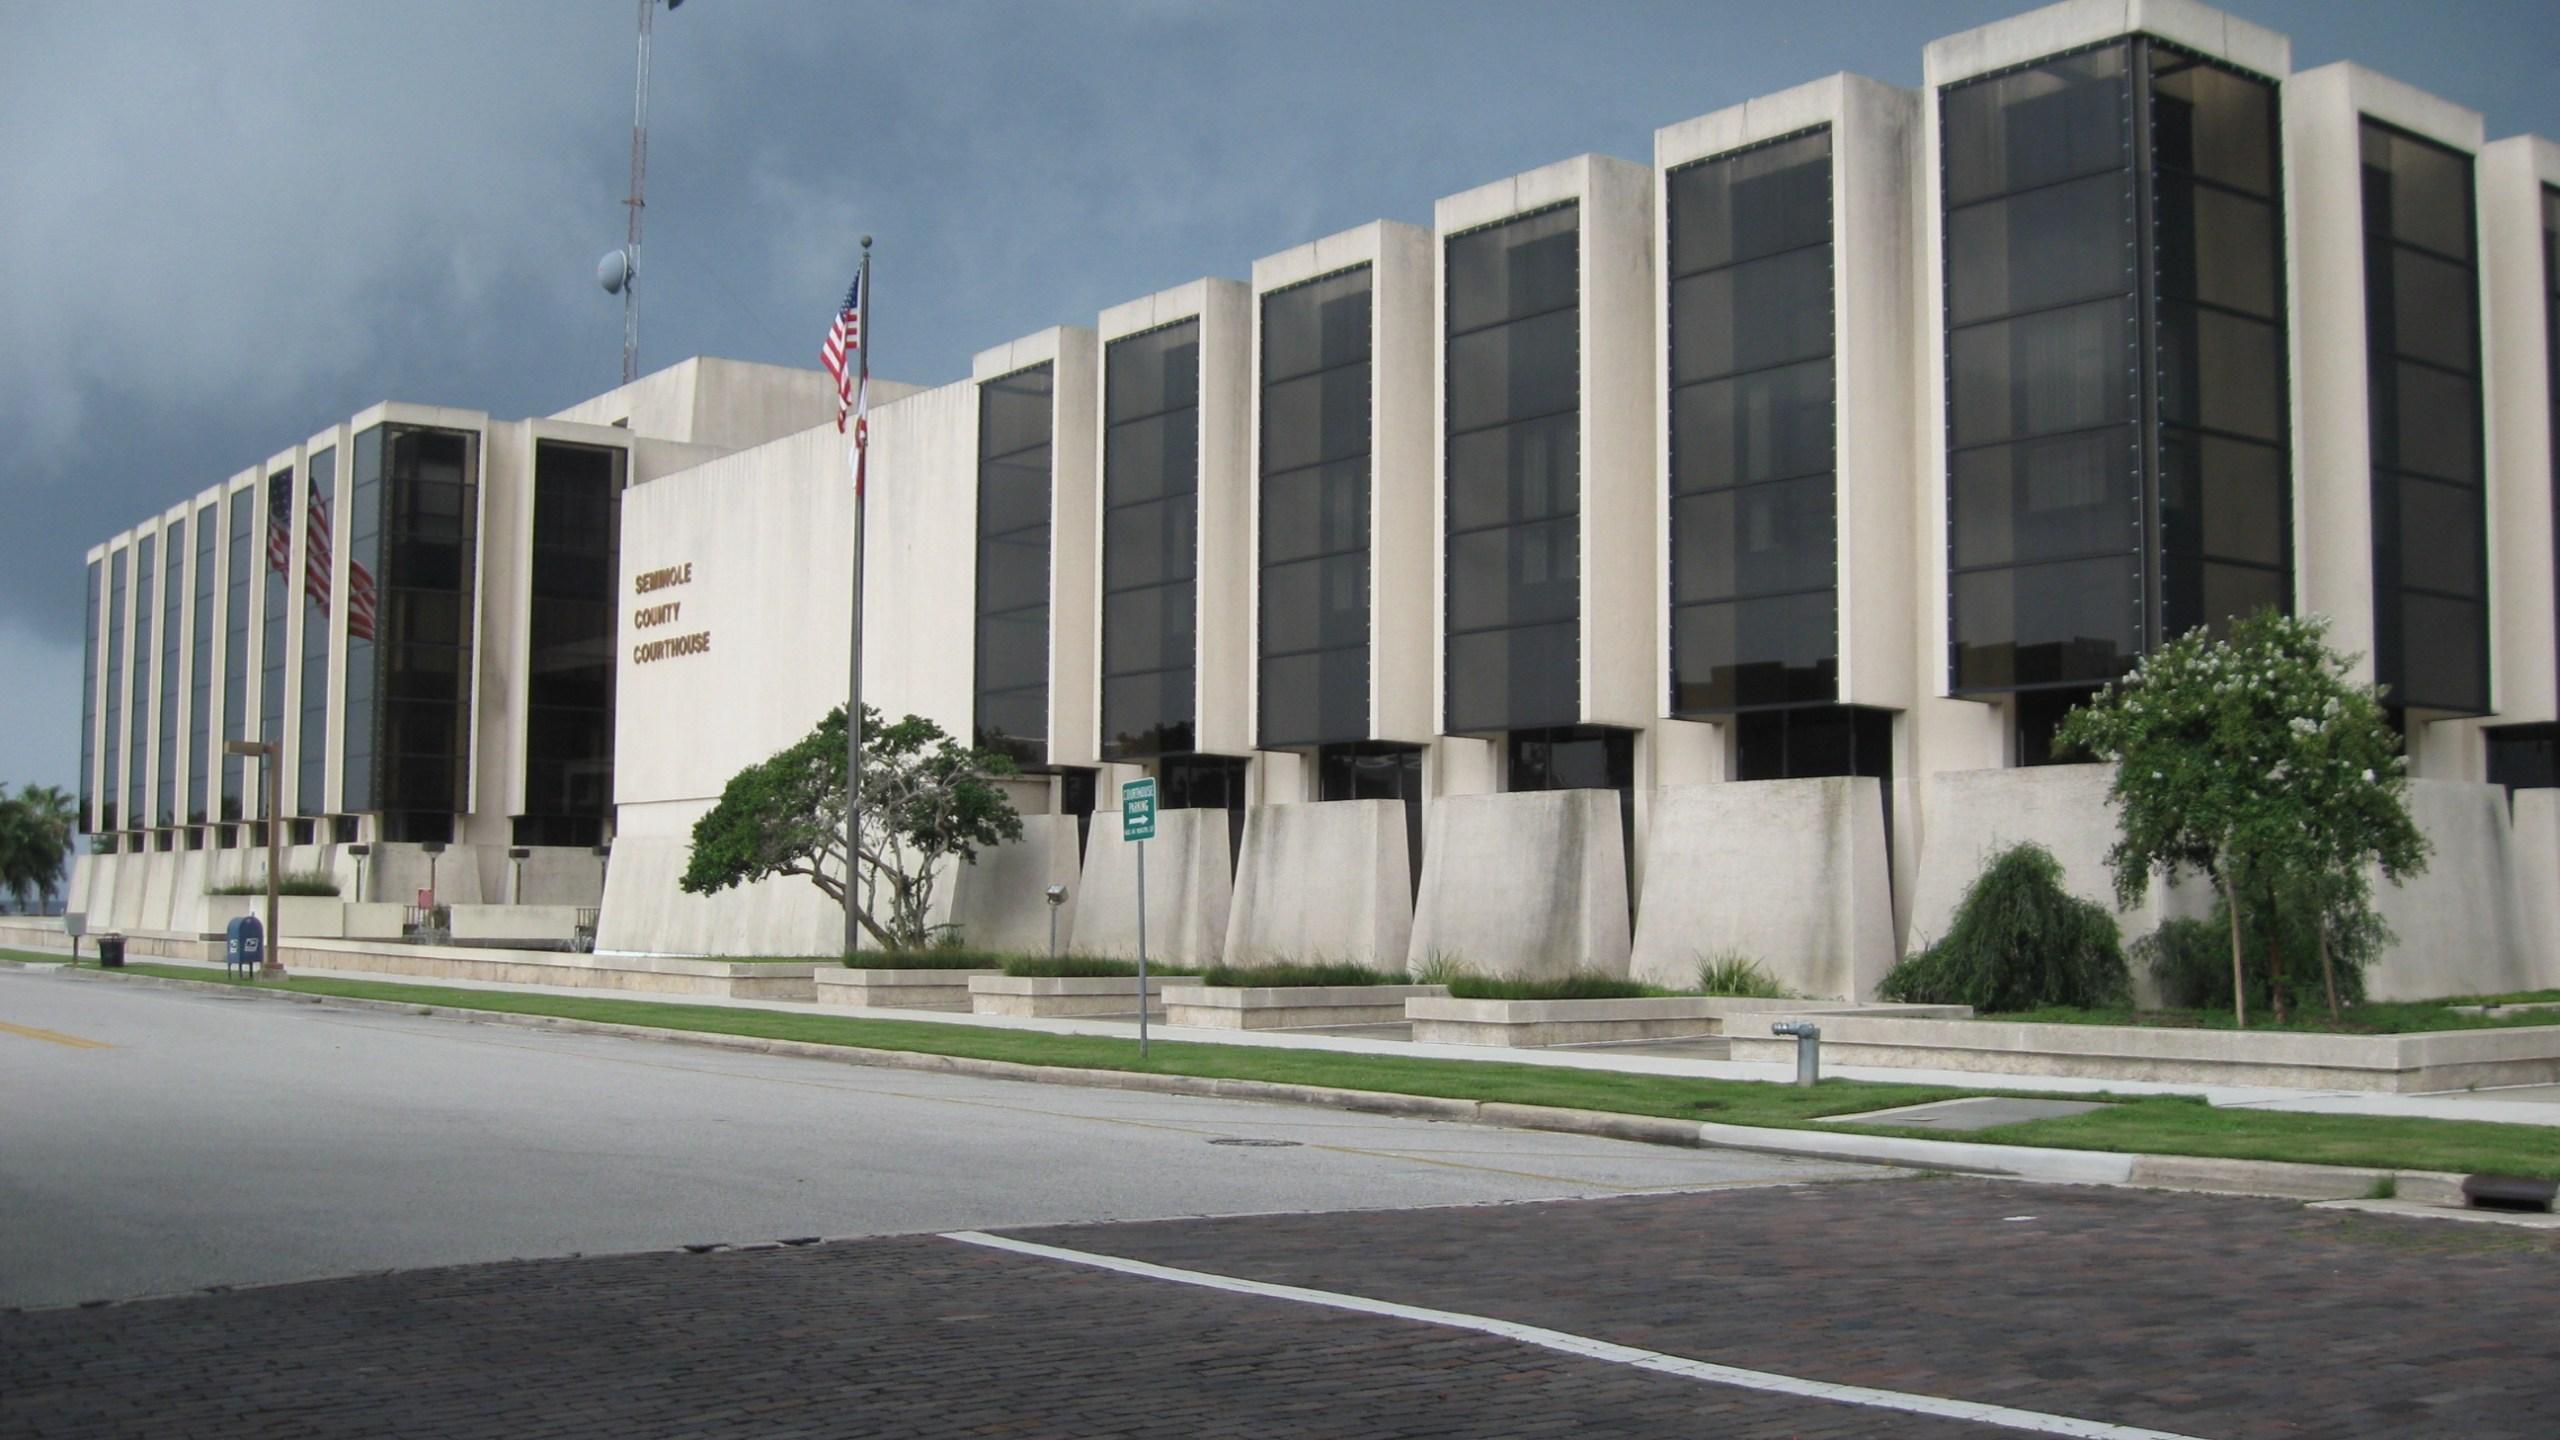 Sanford,_FL,_Courthouse,_Seminole_County,_08-08-2010_(9)_163257